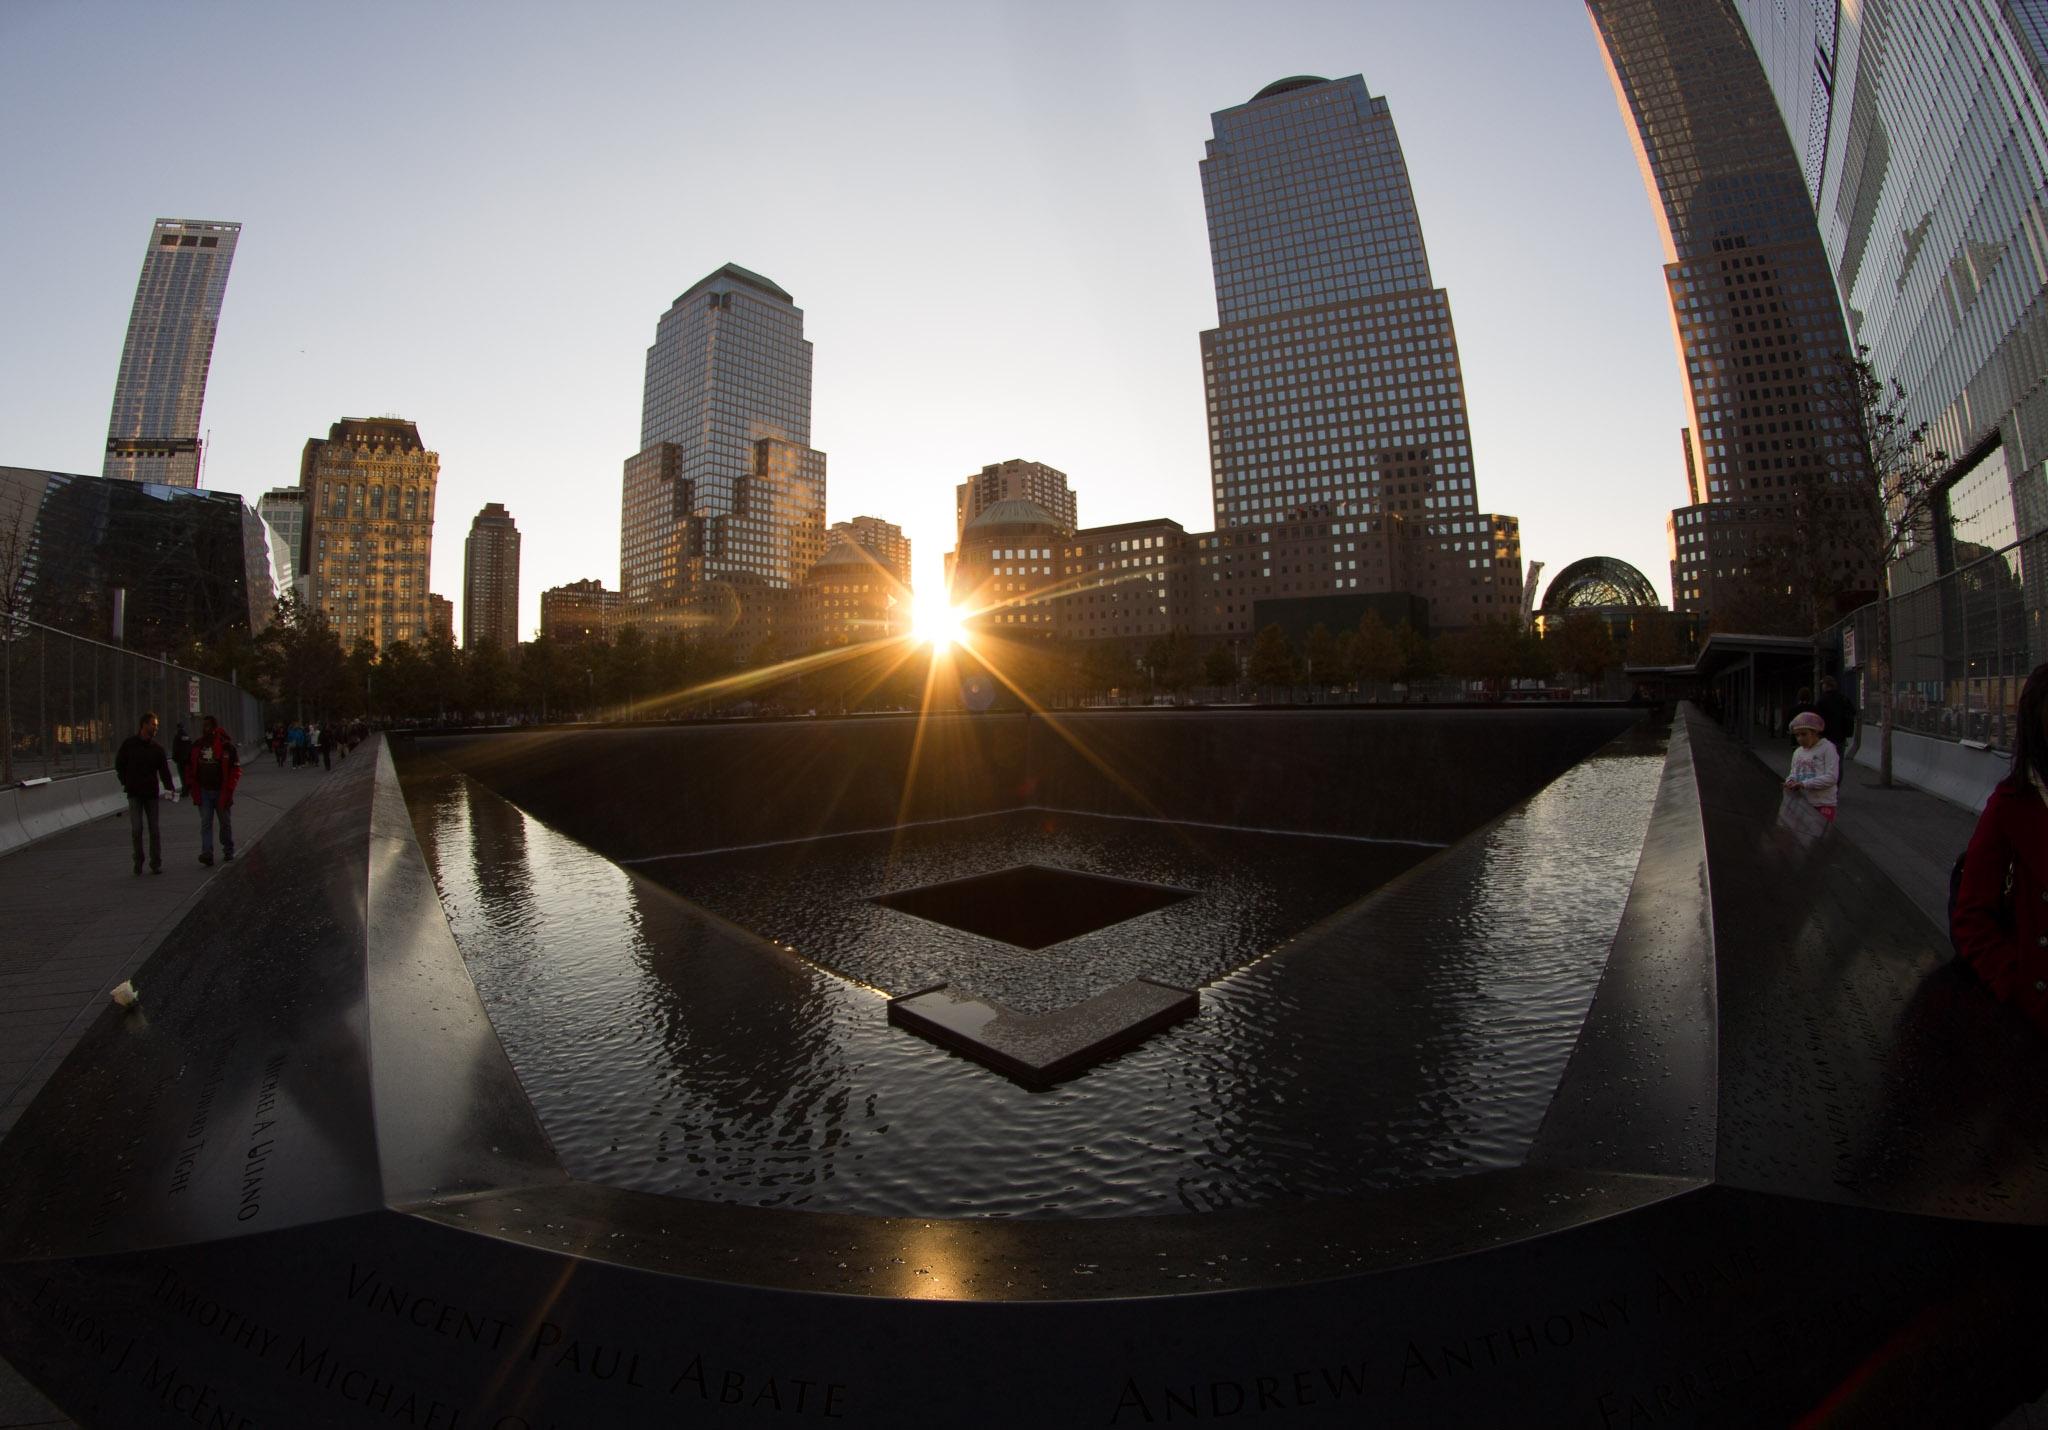 sunset-at-9/11-world-trade-center-memorial